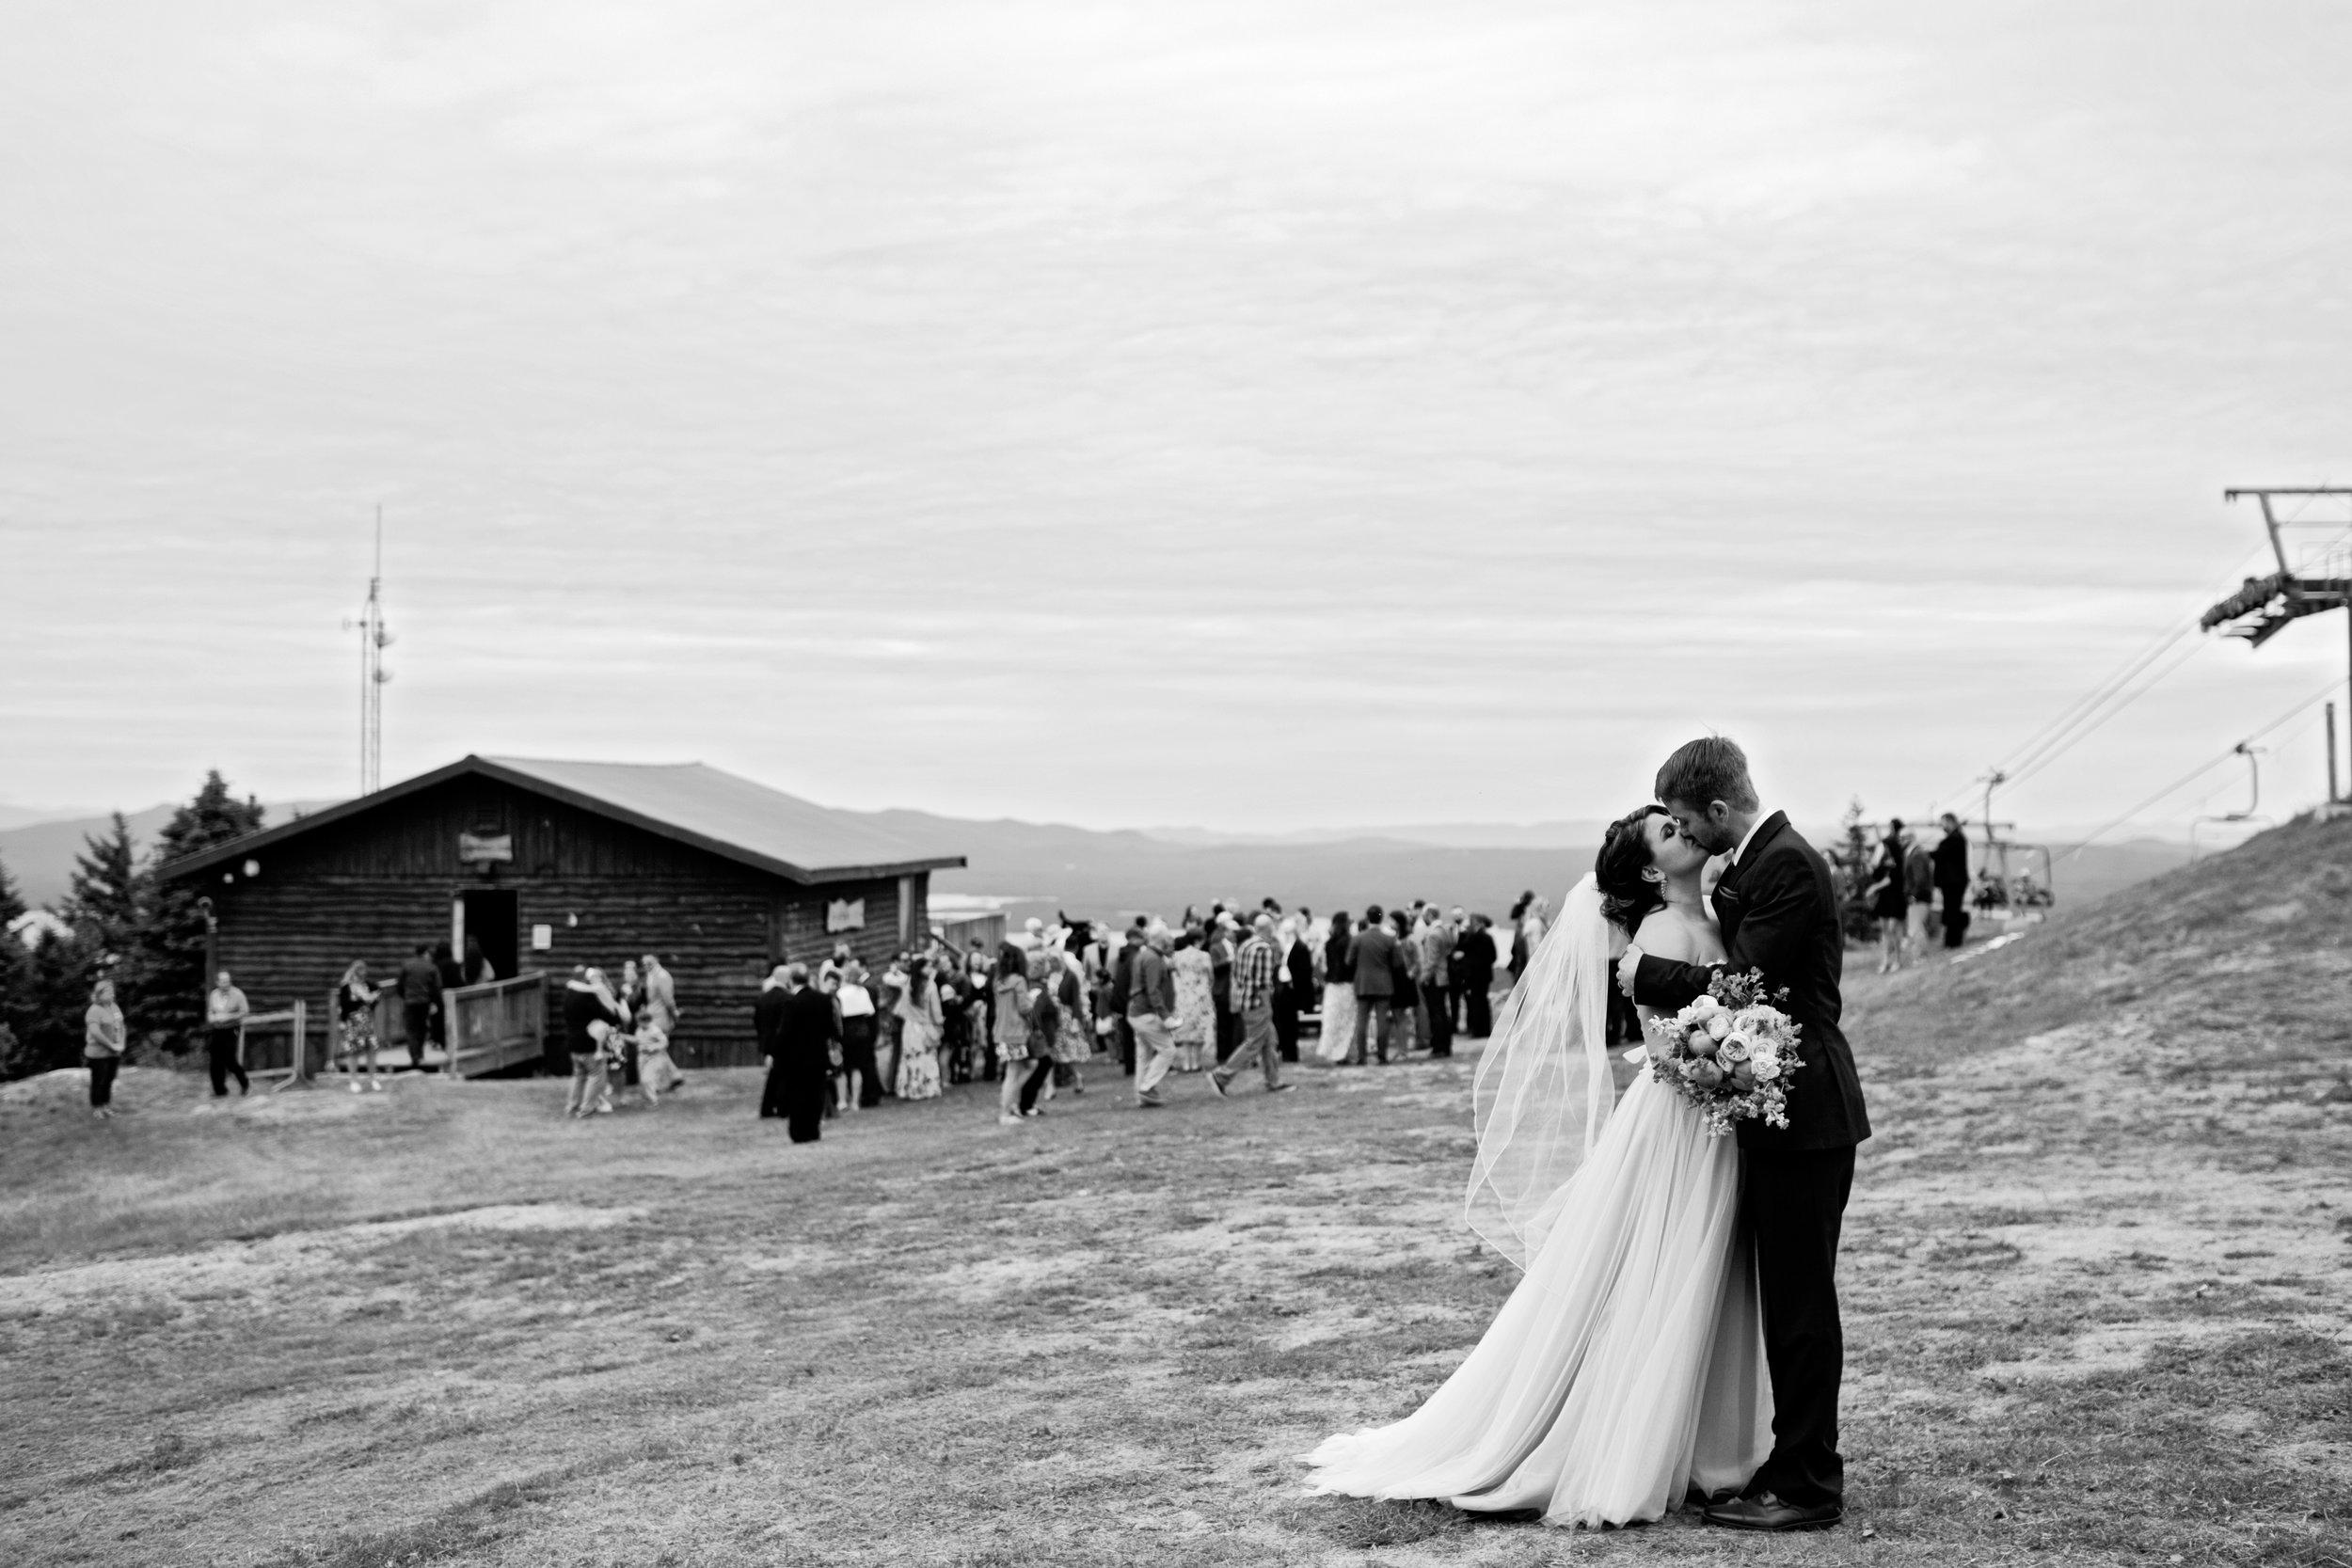 gunstock-mountain-resort-wedding-photos-01.JPG